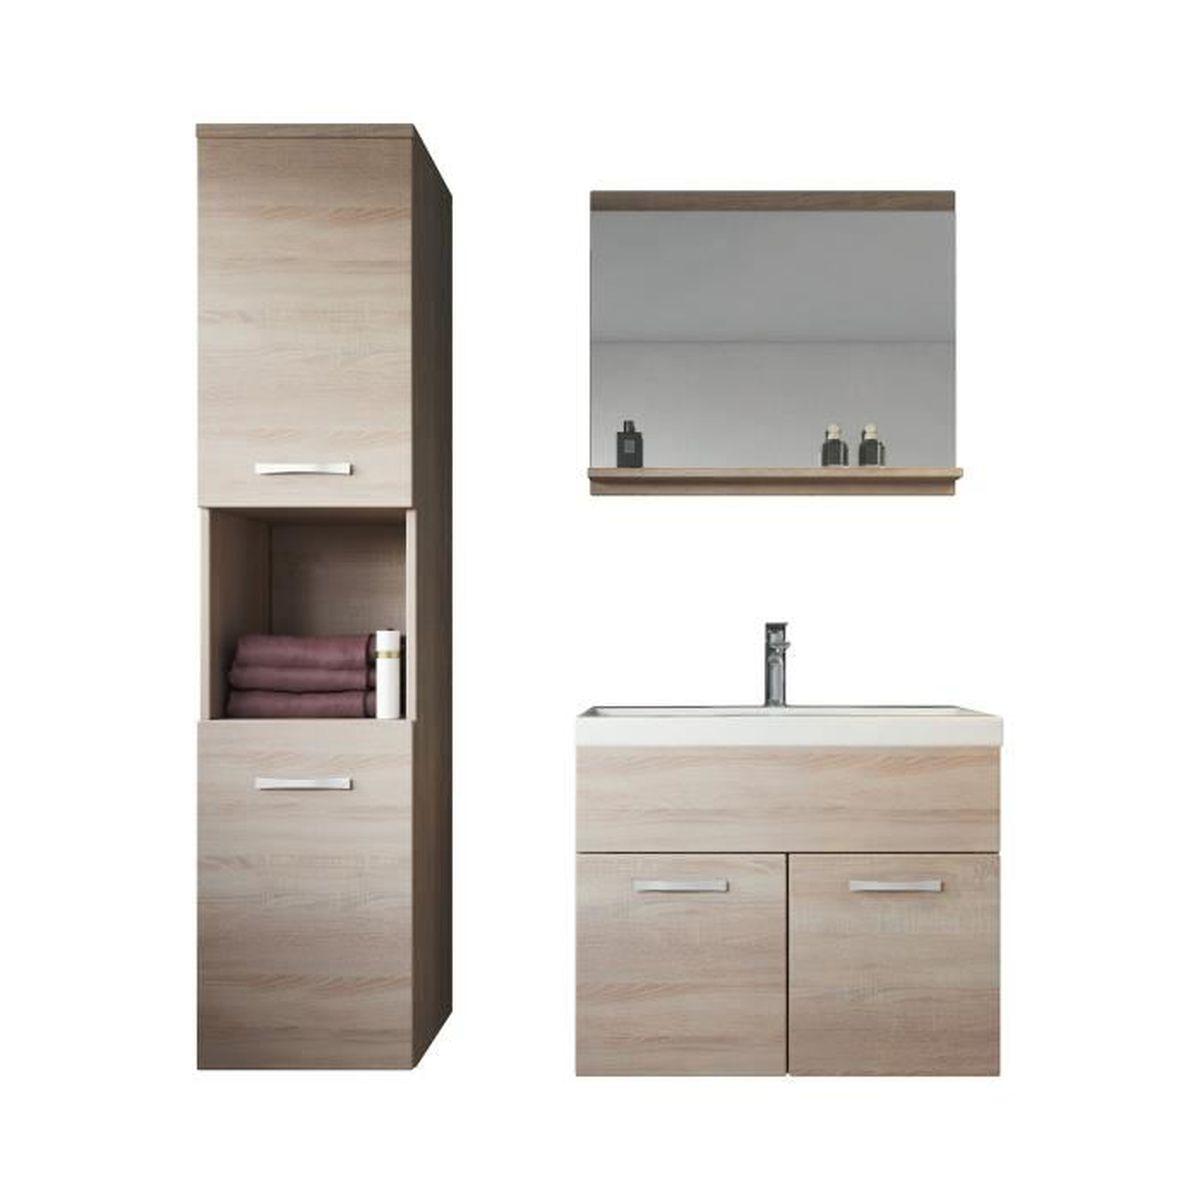 Meuble de salle de bain de Montréal 20x20 cm Meuble lavabo